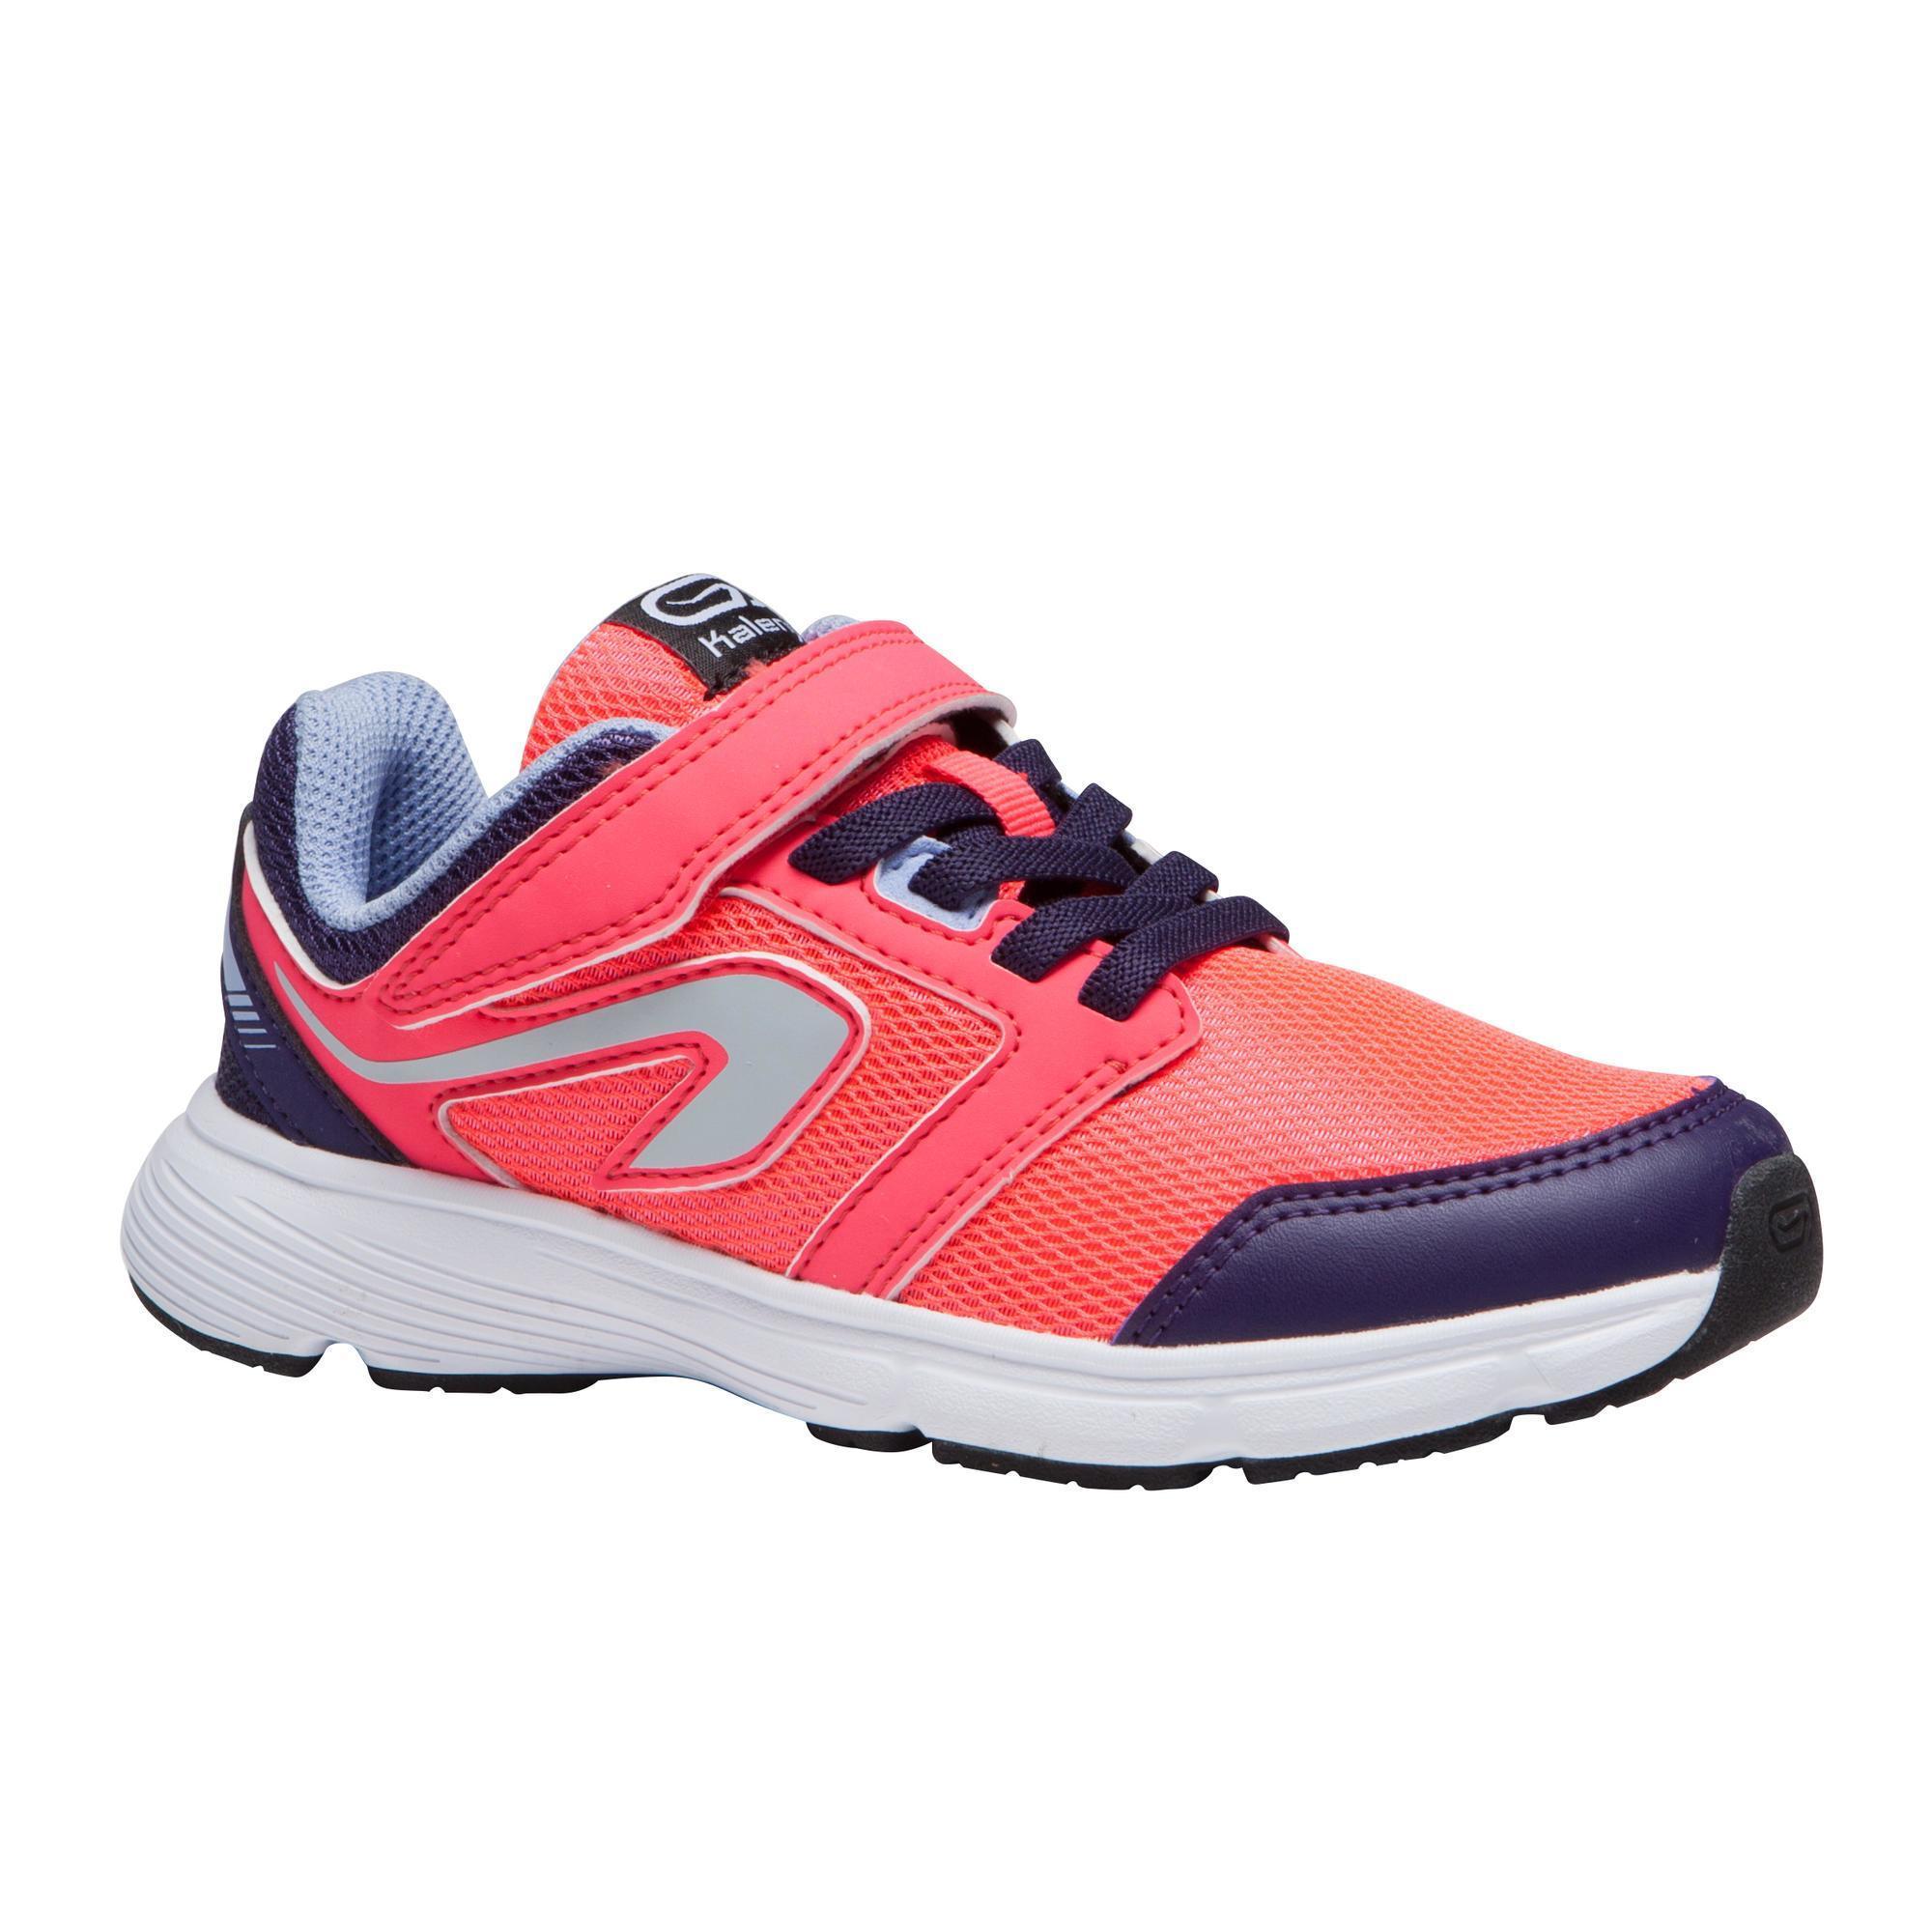 newest collection 0111c ebc59 Chaussures Running   Decathlon